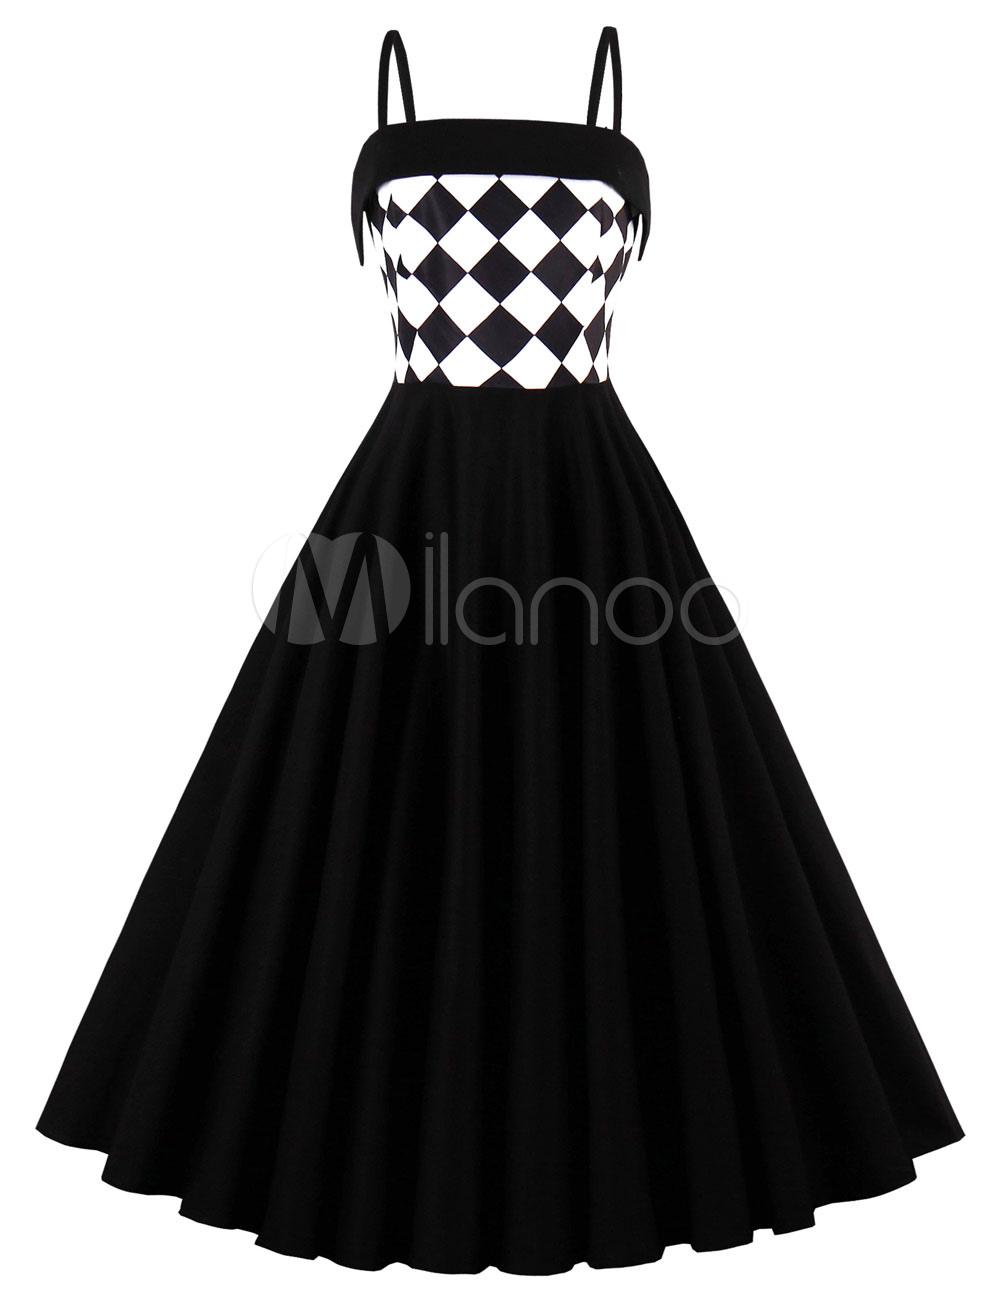 Black Vintage Dress Women Straps Sleeveless Geometric Print Summer Swing Dresses (Women\\'s Clothing Vintage Dresses) photo